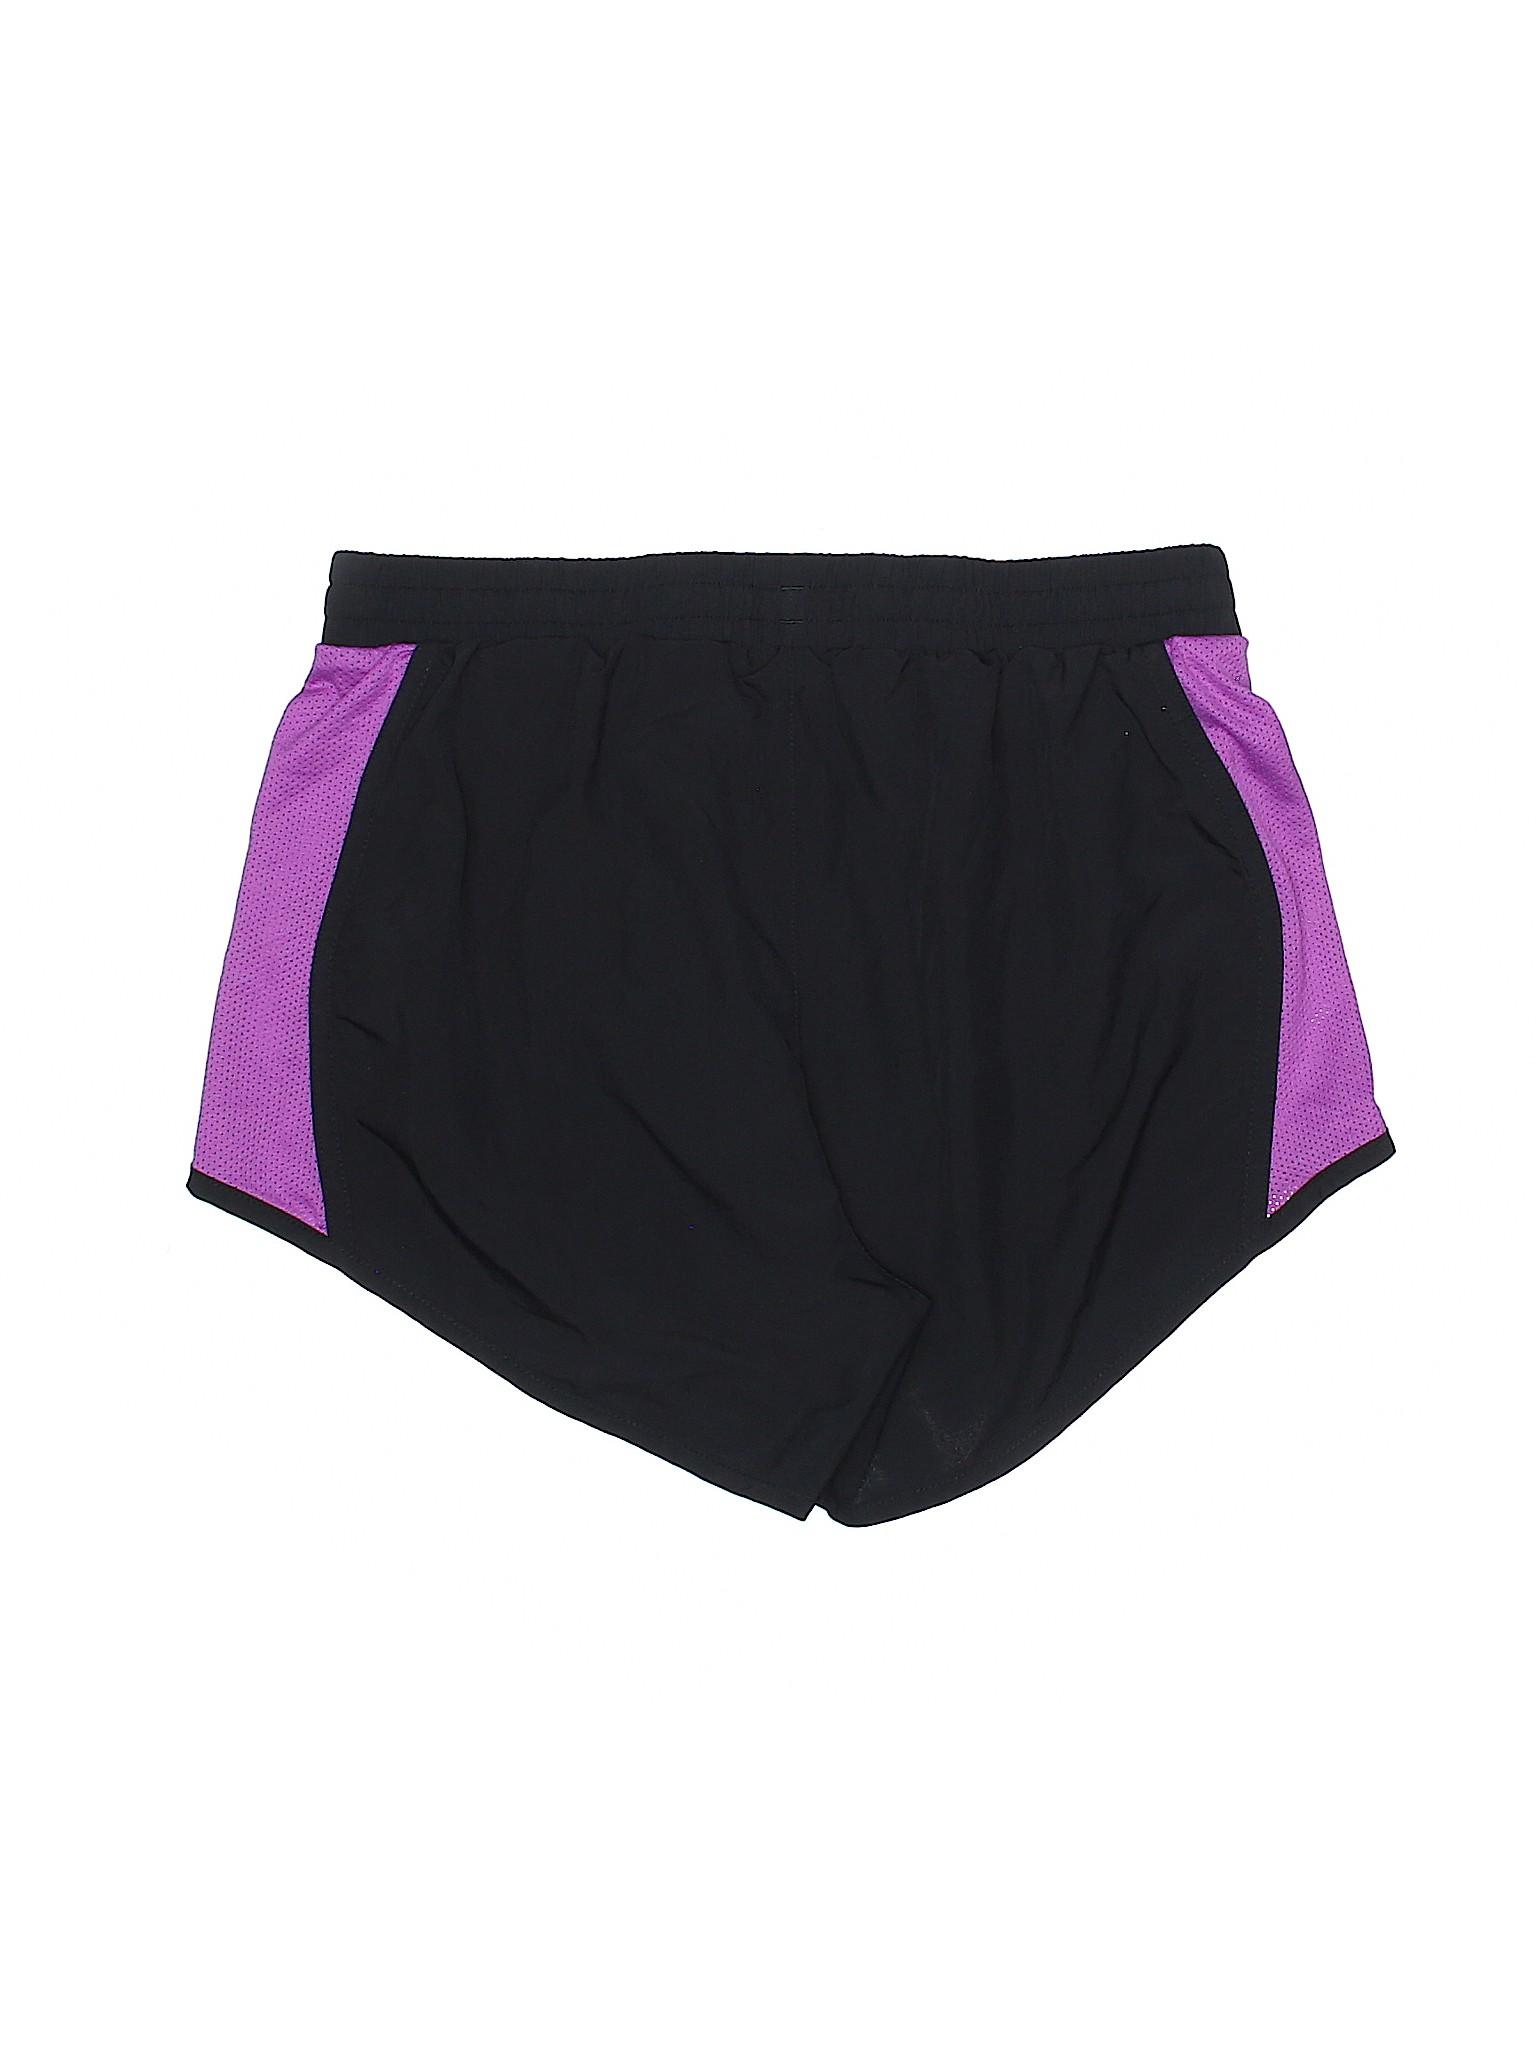 Boutique Armour Shorts Under Athletic Armour Athletic Under Boutique Shorts RAUpvZvq